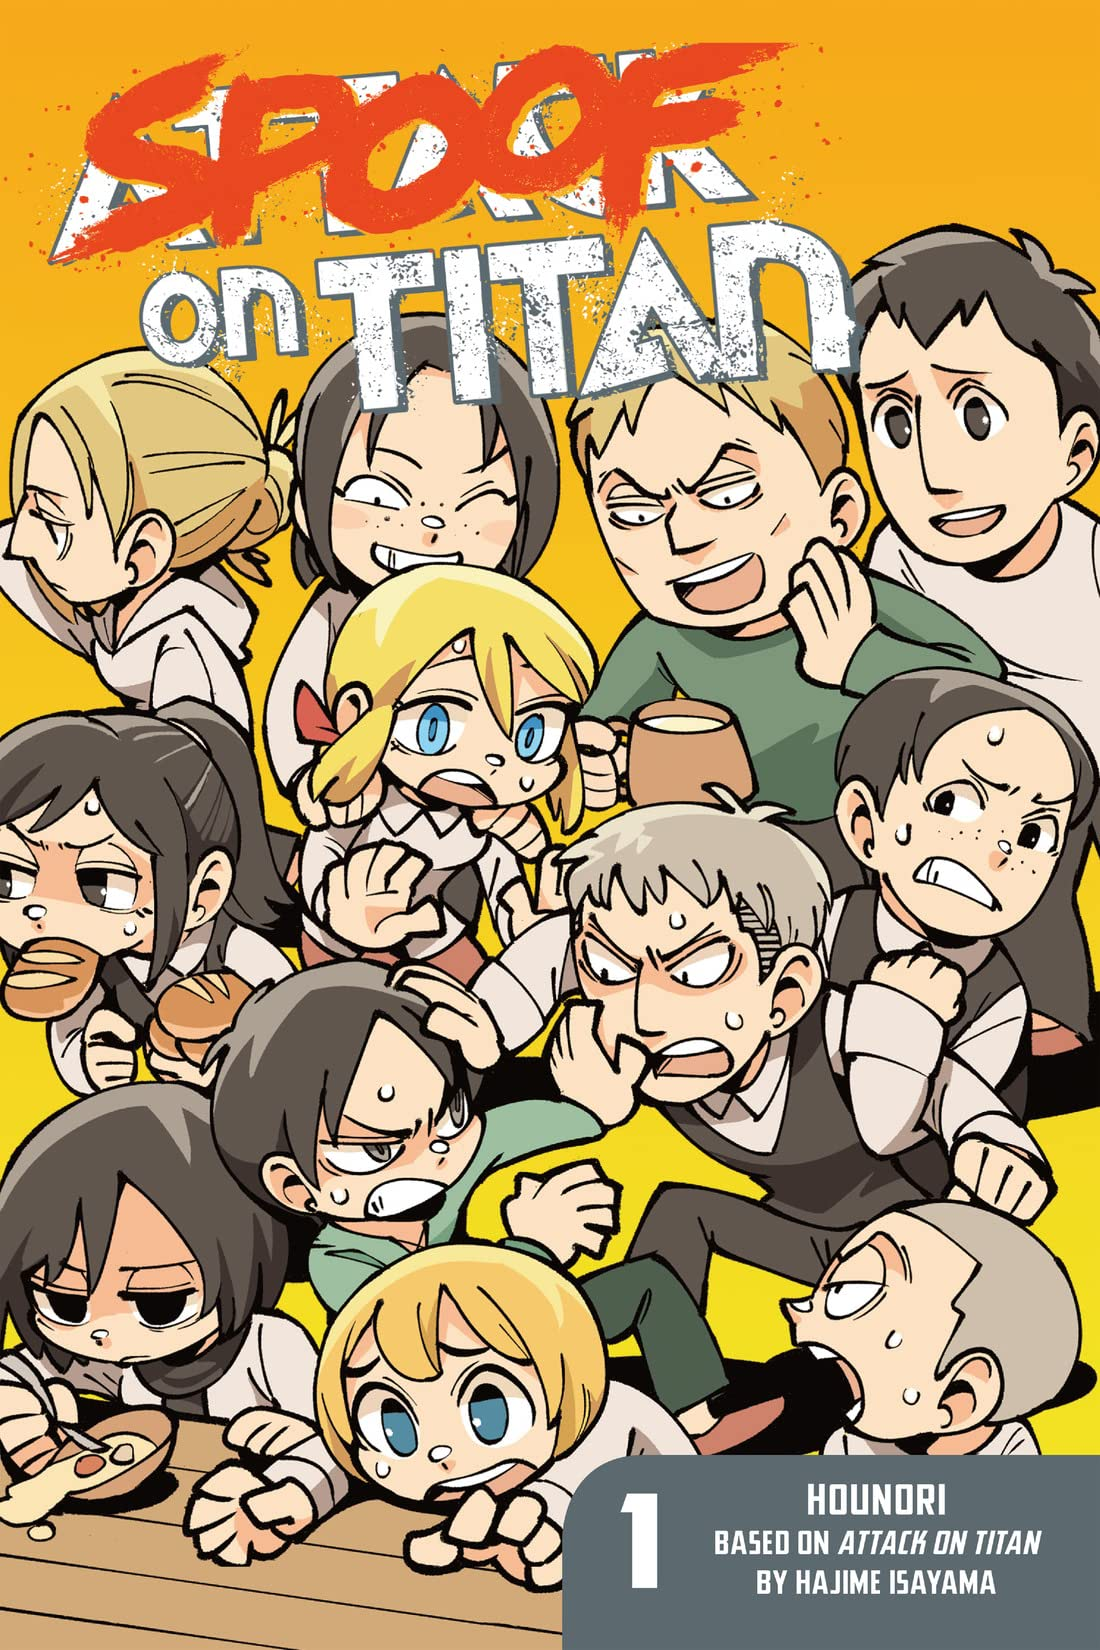 Spoof on Titan Vol. 1